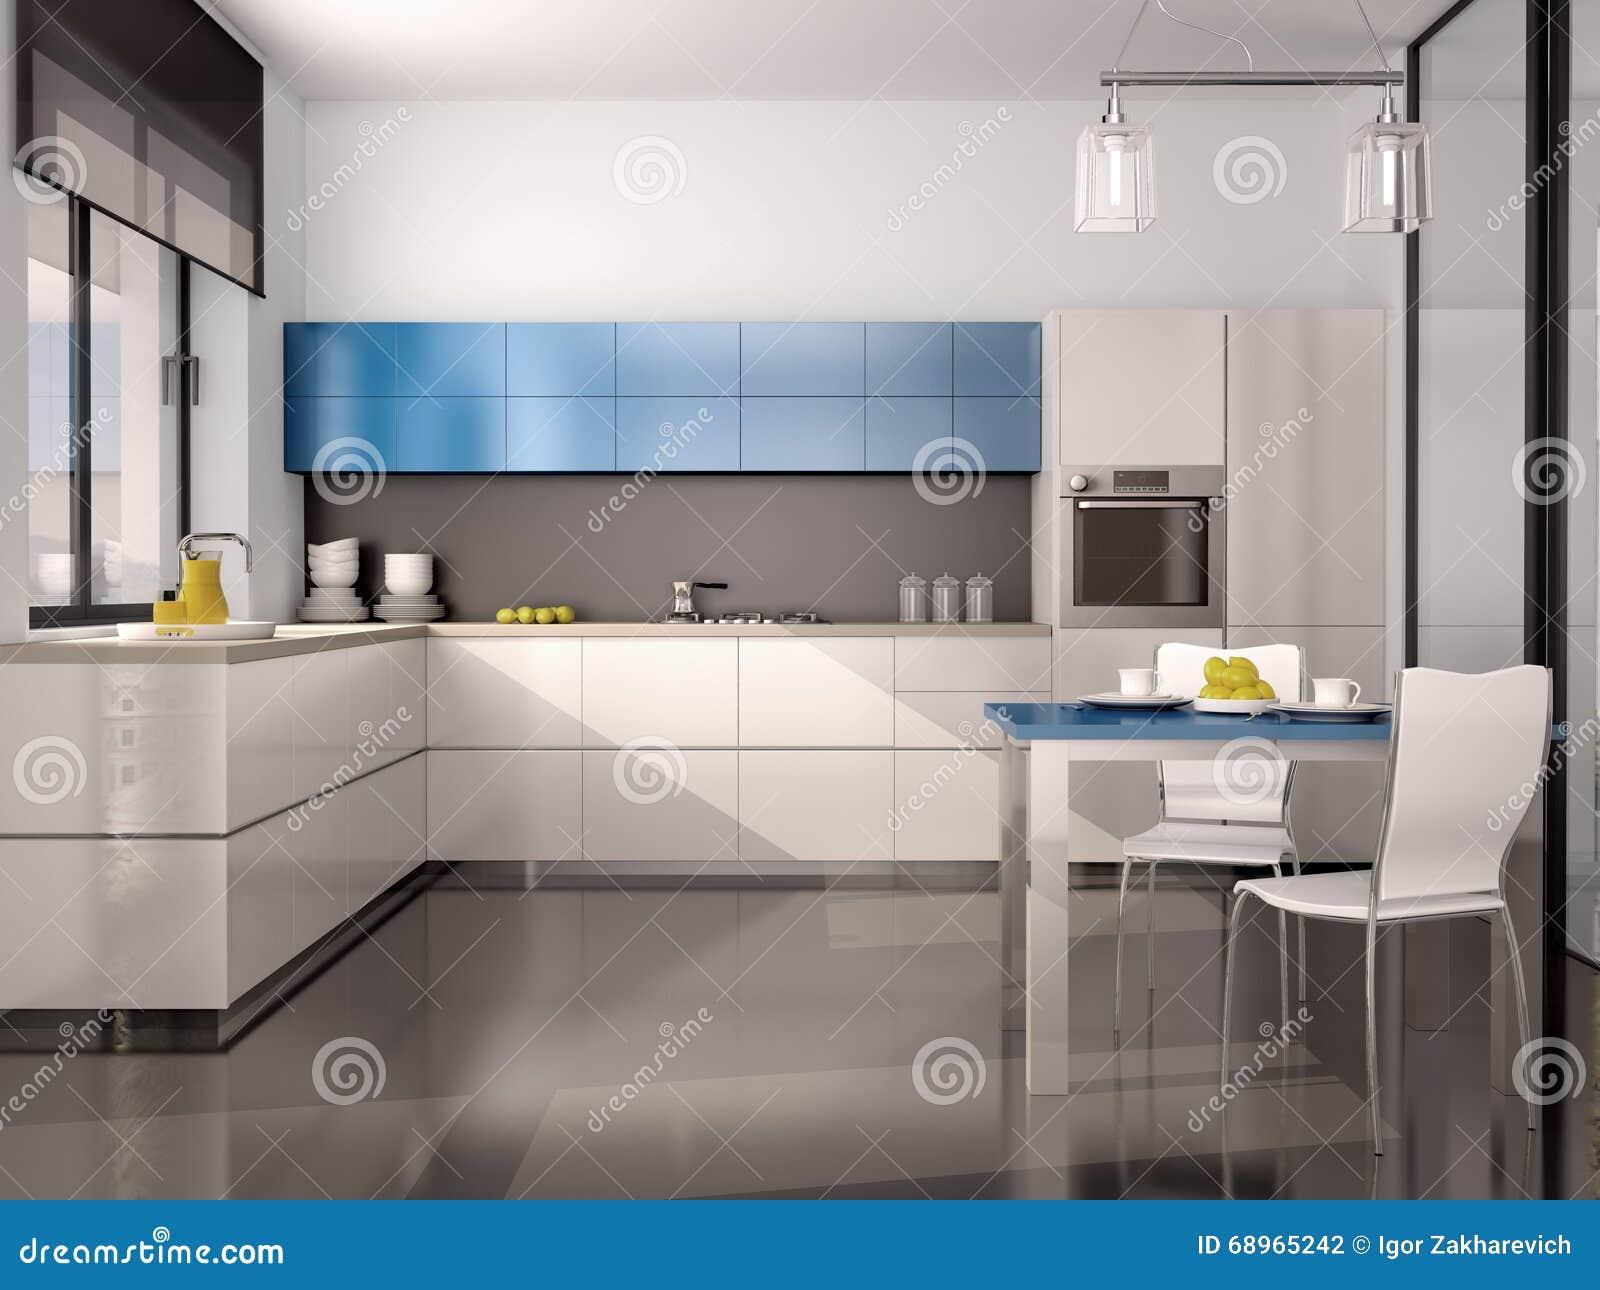 Illustration Of Interior Of Modern Kitchen In White Blue Gray